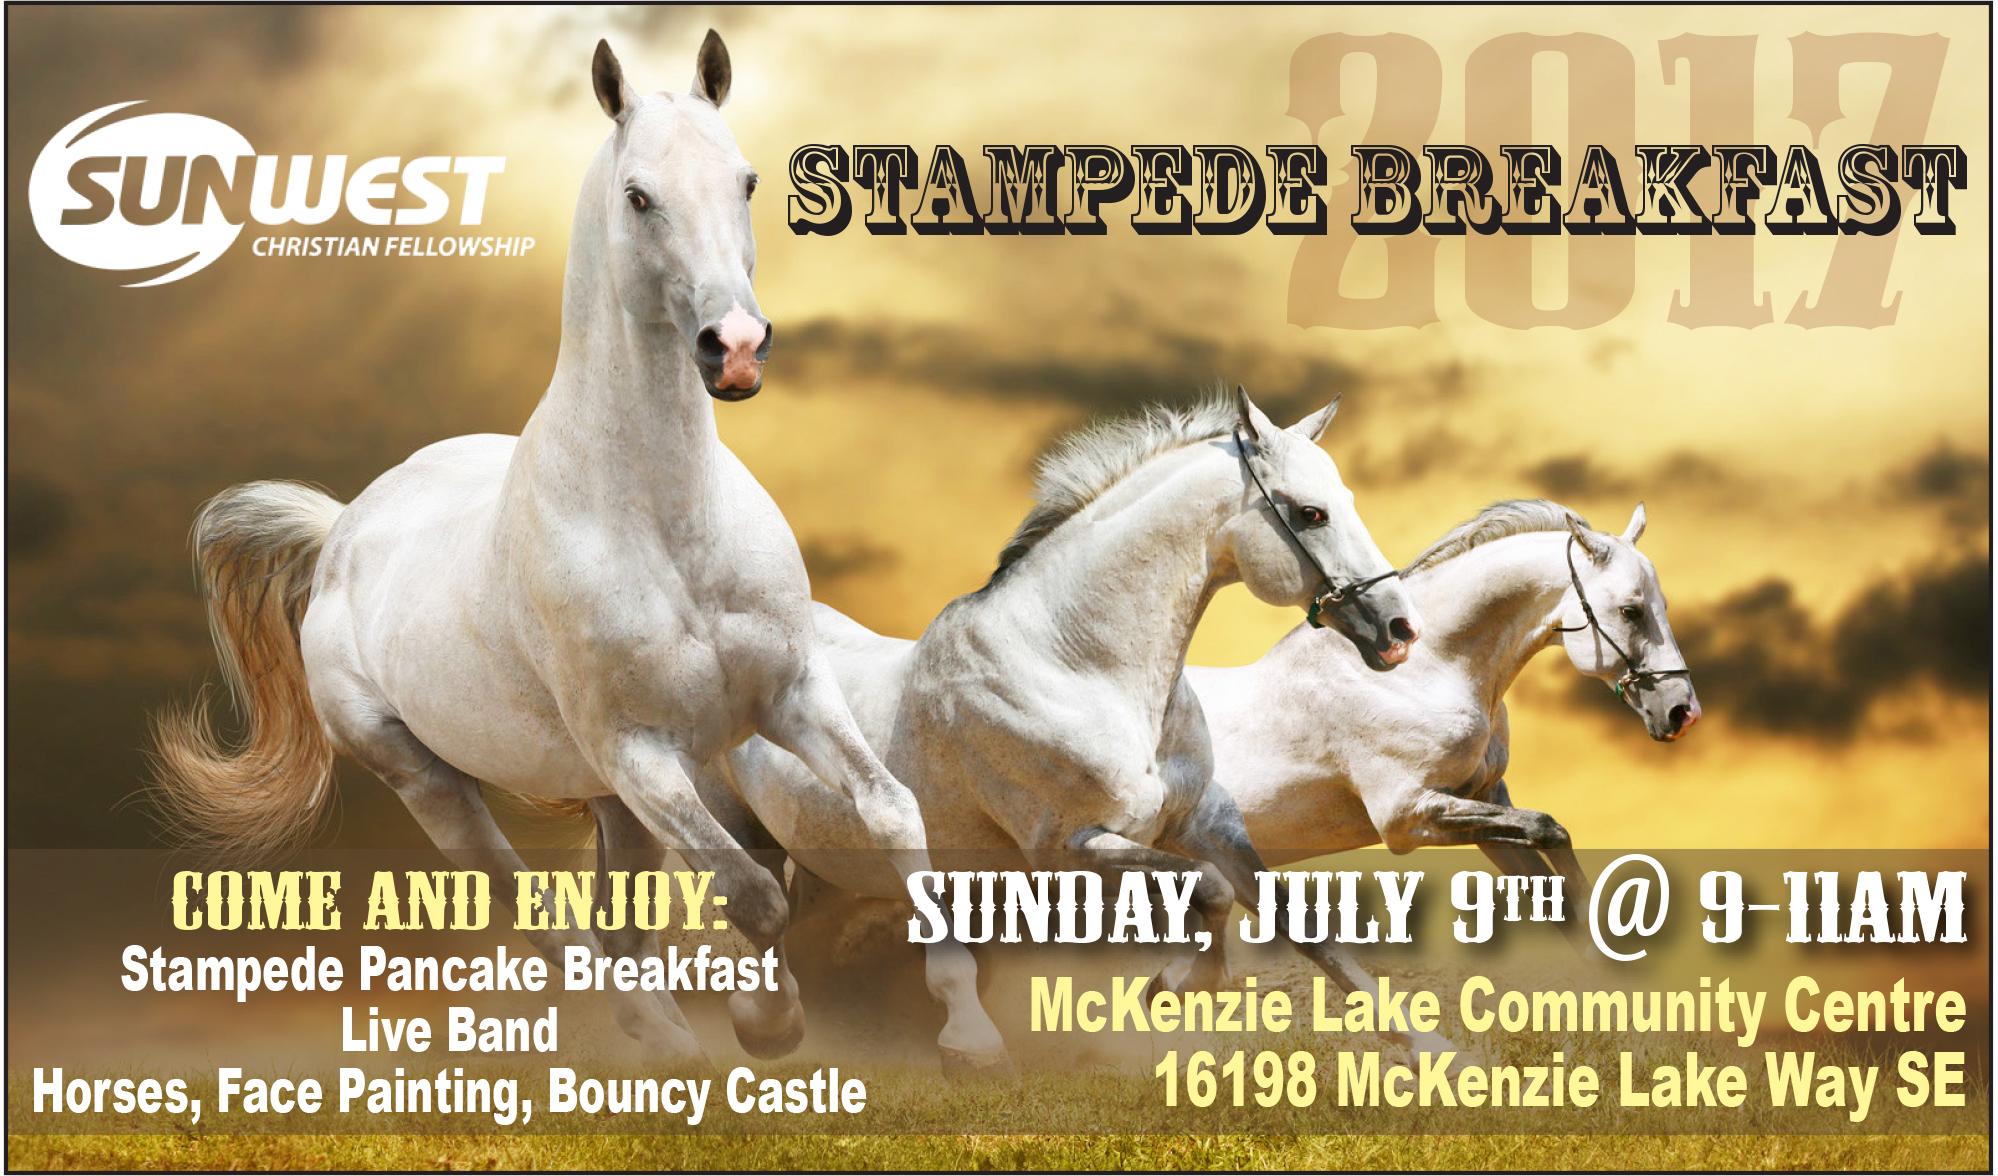 Free Stampede Breakfast Sunwest Church 2017